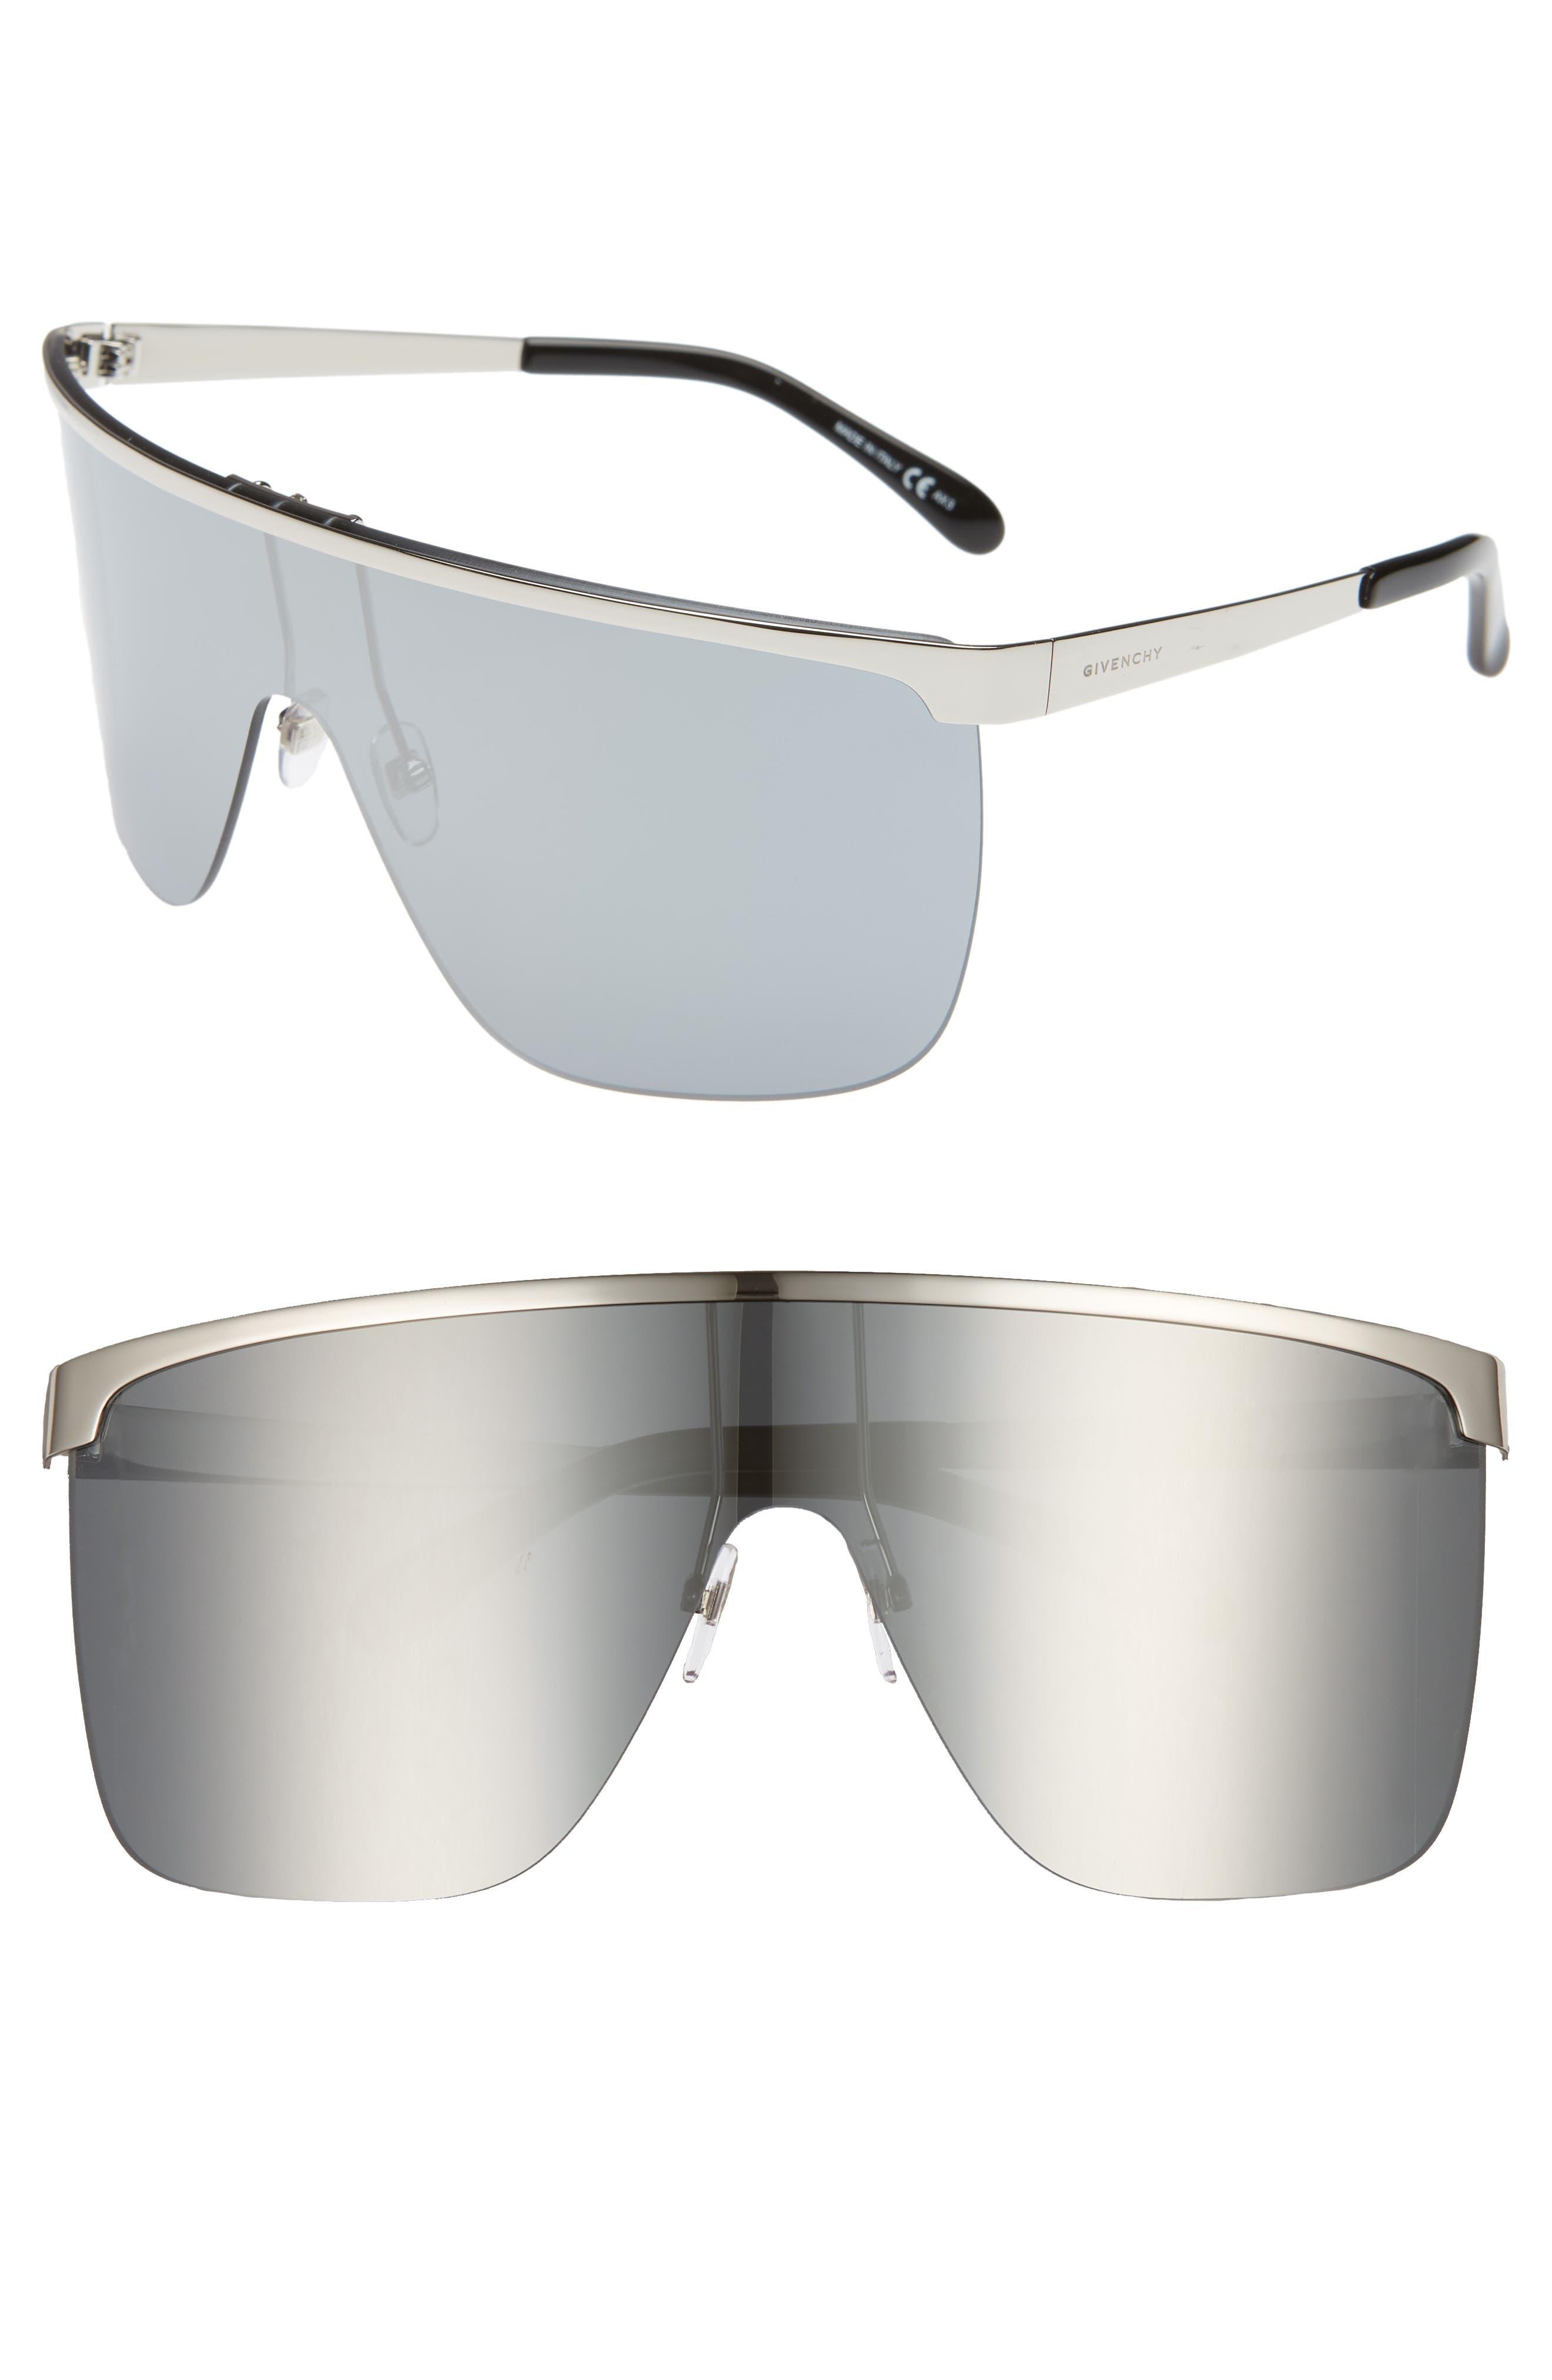 70mm Rimless Shield Sunglasses,                         Main,                         color, PALLADIUM